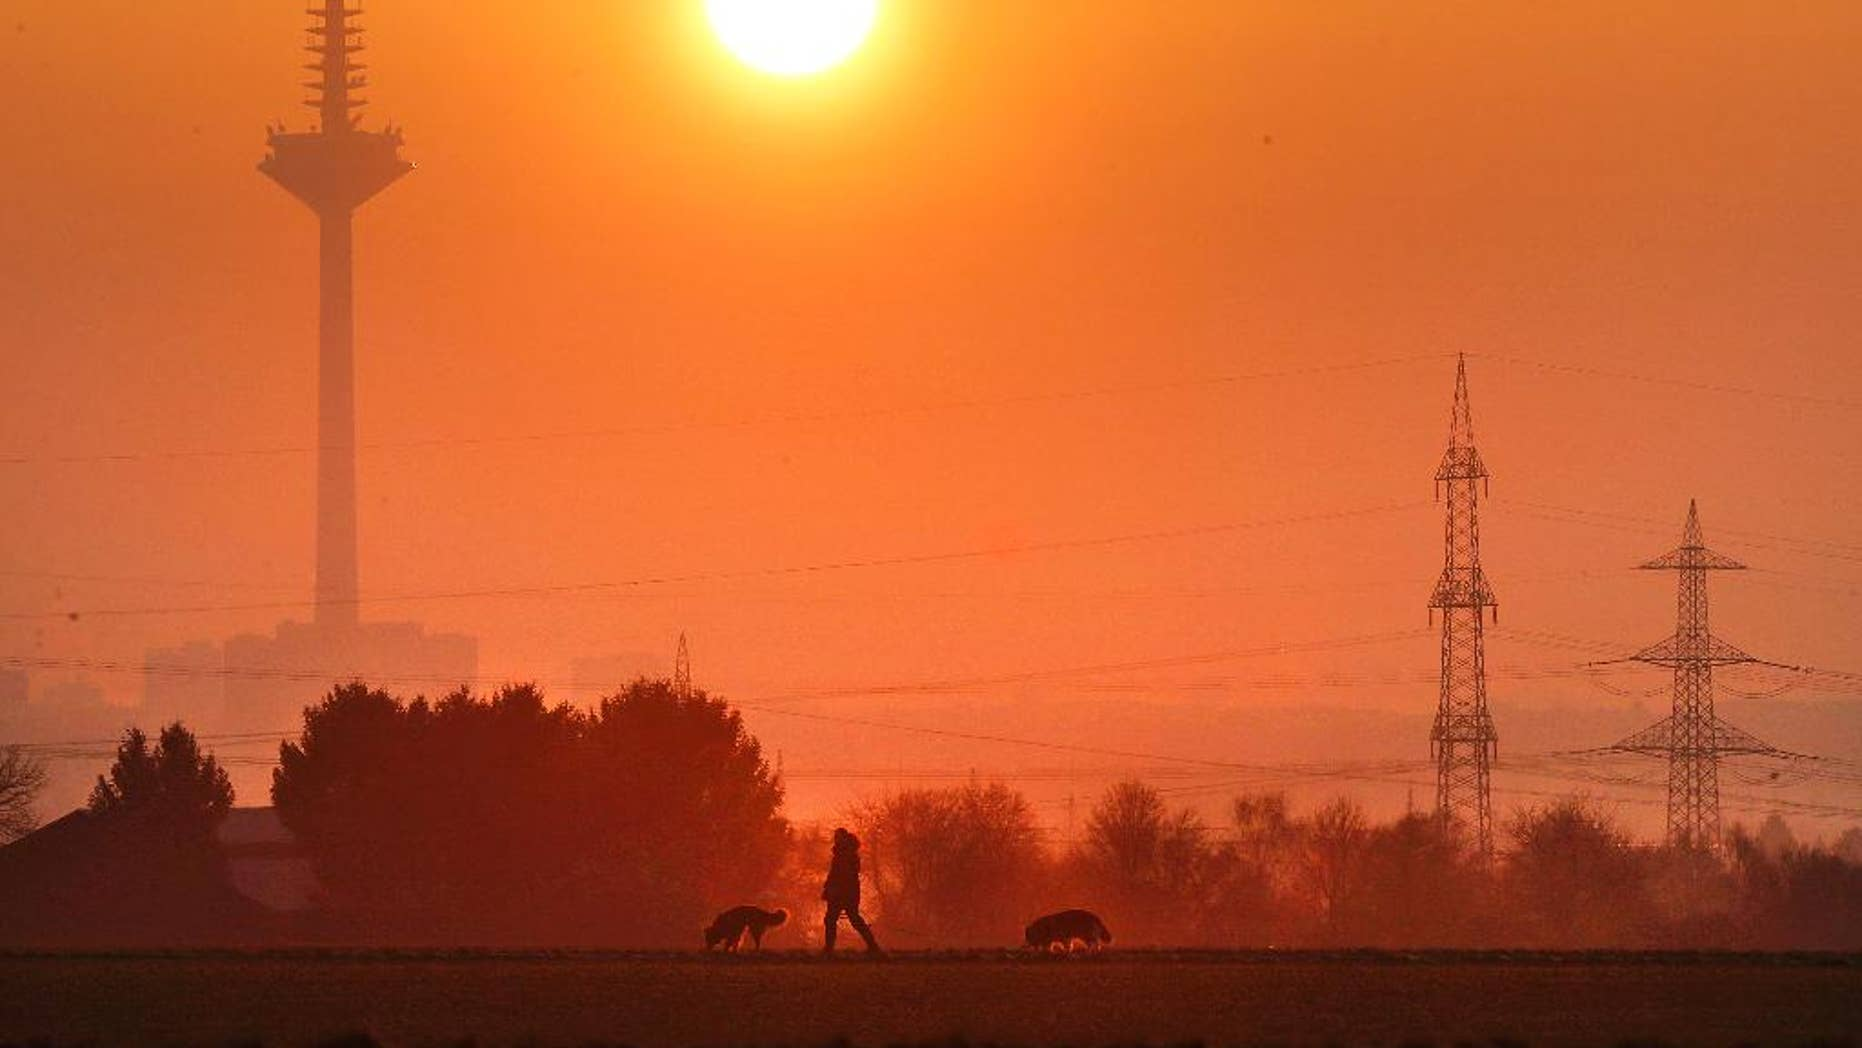 A man walks his dogs as the sun rises on a field in Eschborn near Frankfurt, Germany, Wednesday, Feb. 15, 2017. (AP Photo/Michael Probst)